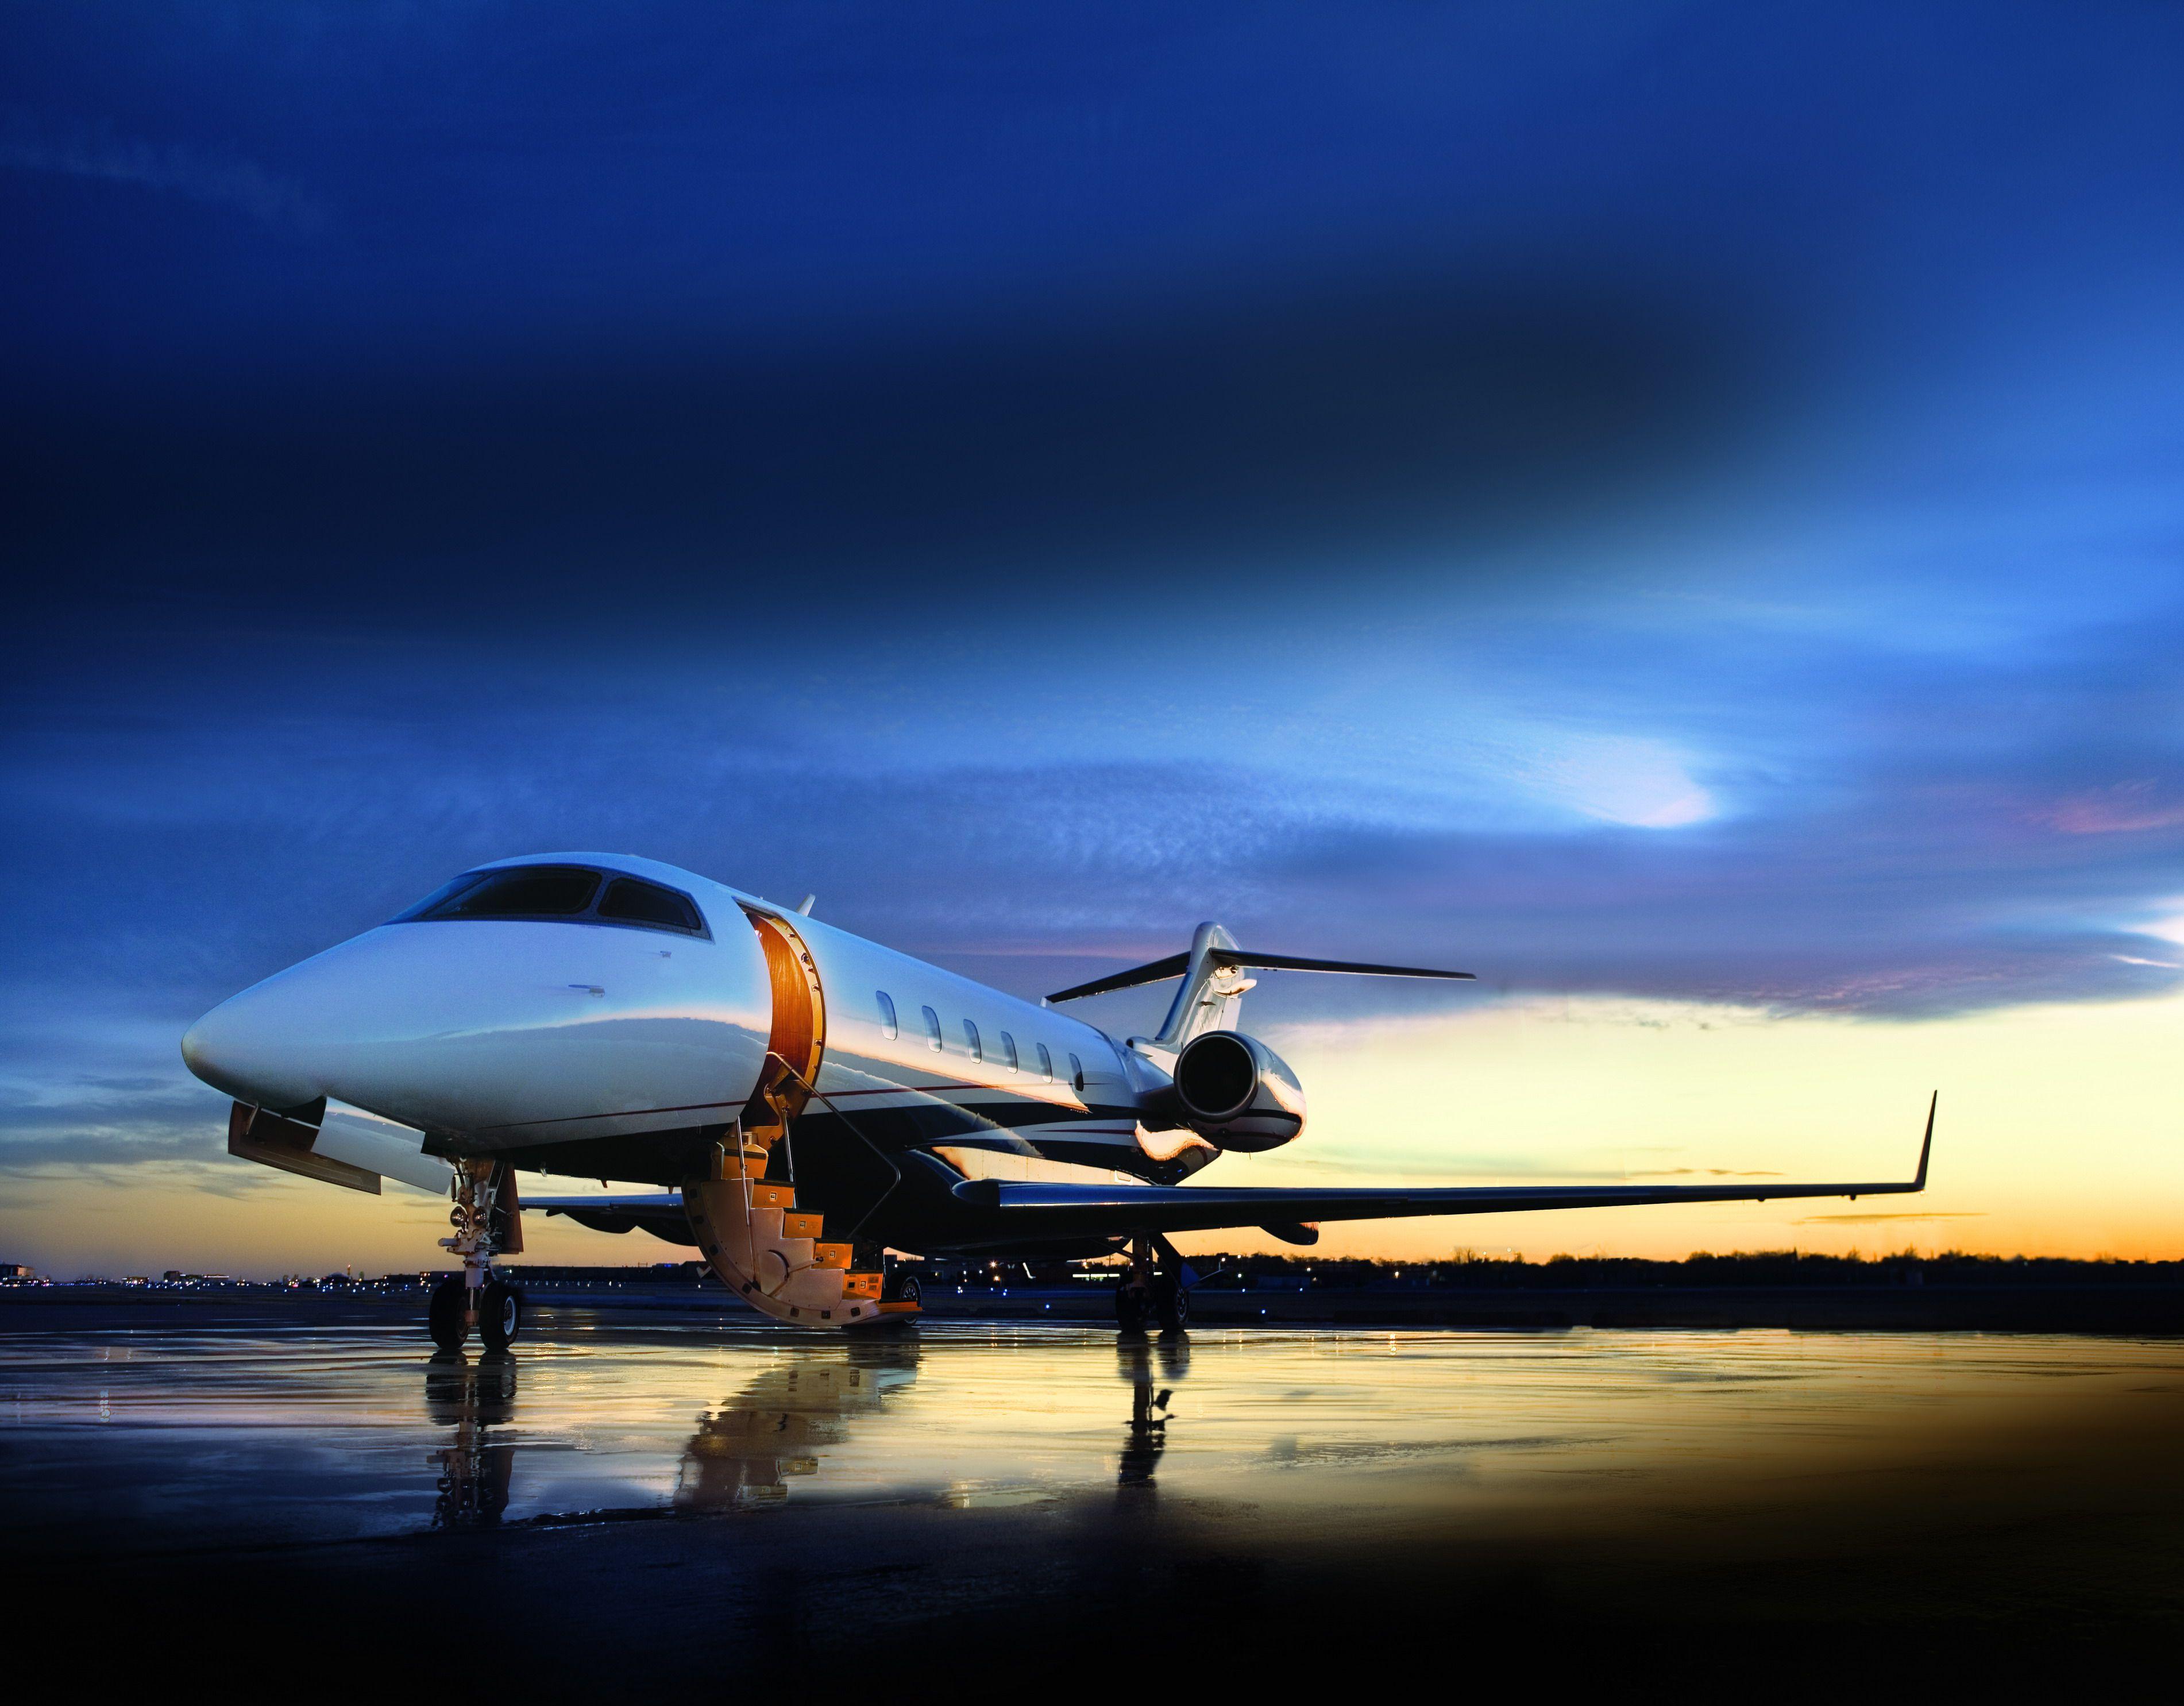 Private jet desktop wallpapers top free private jet - Jet wallpaper ...